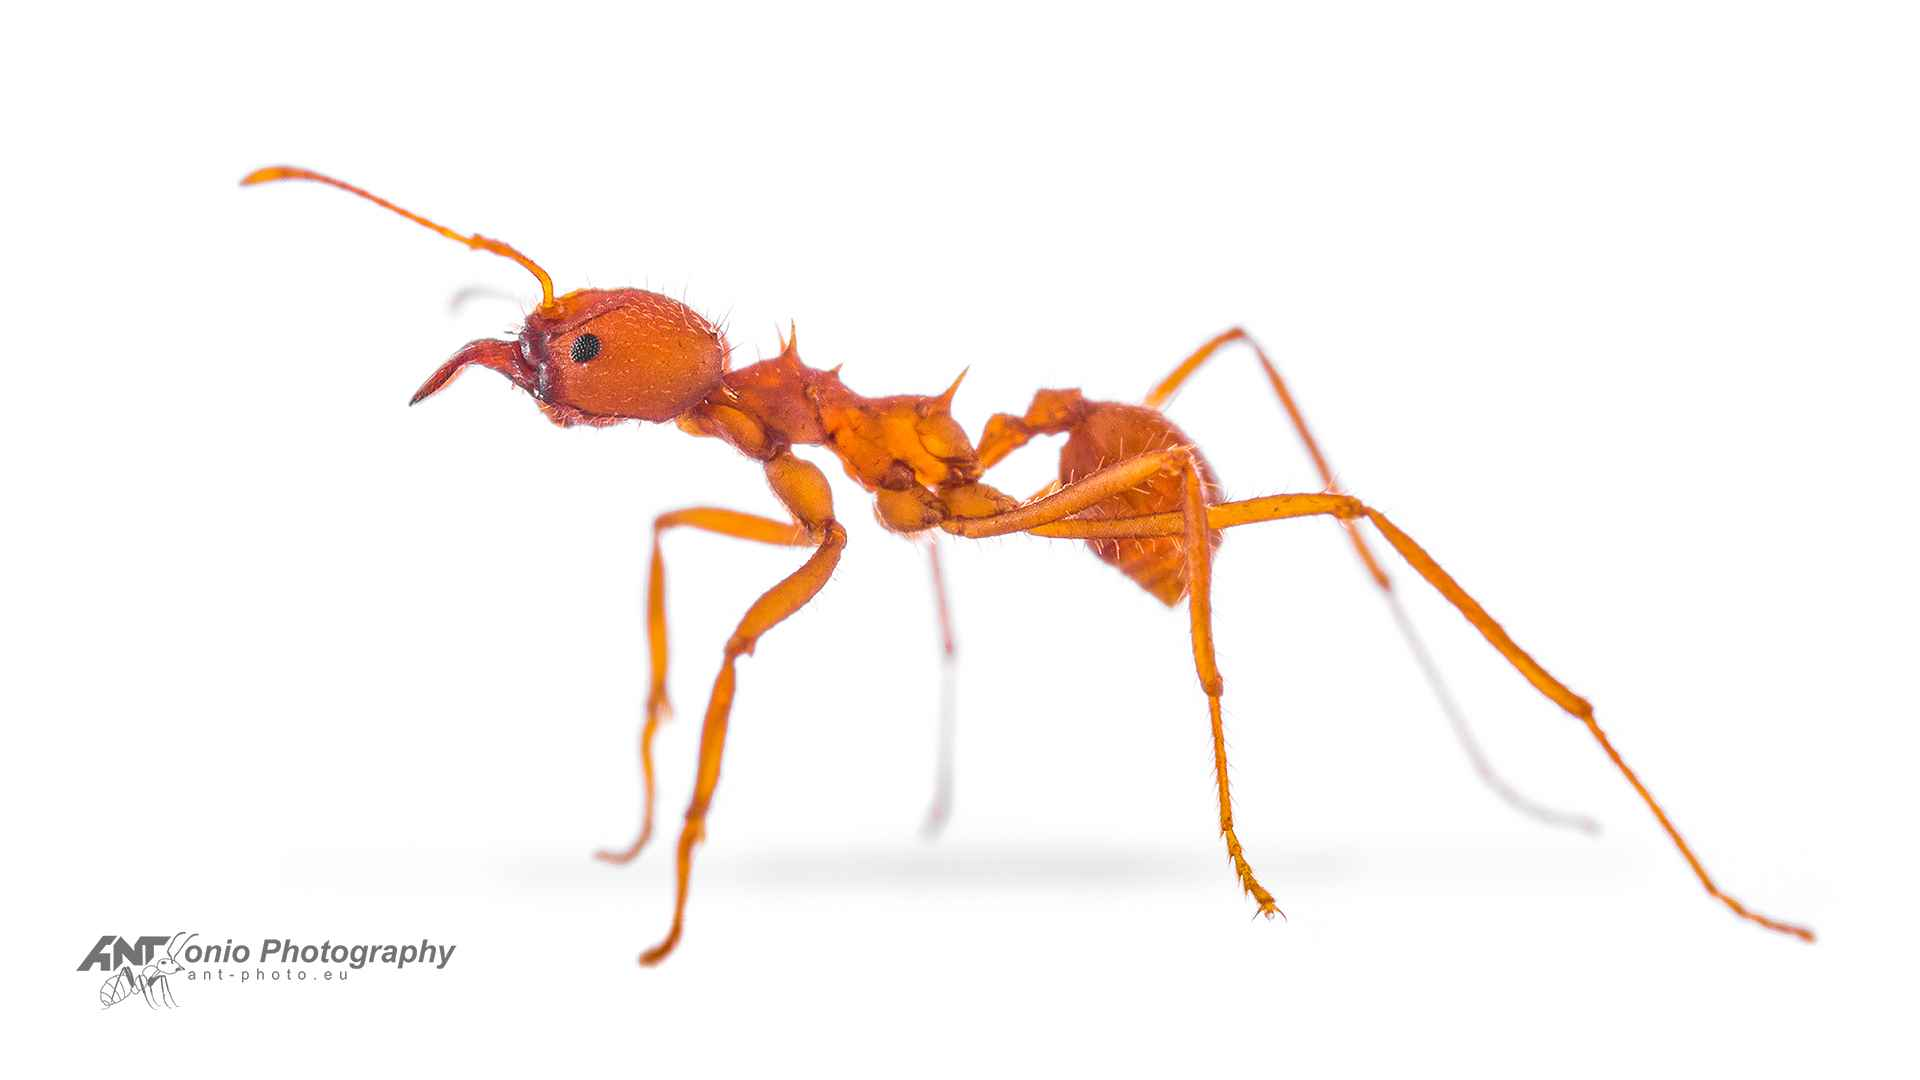 Atta laevigata caribbean pine leaf cutting ant